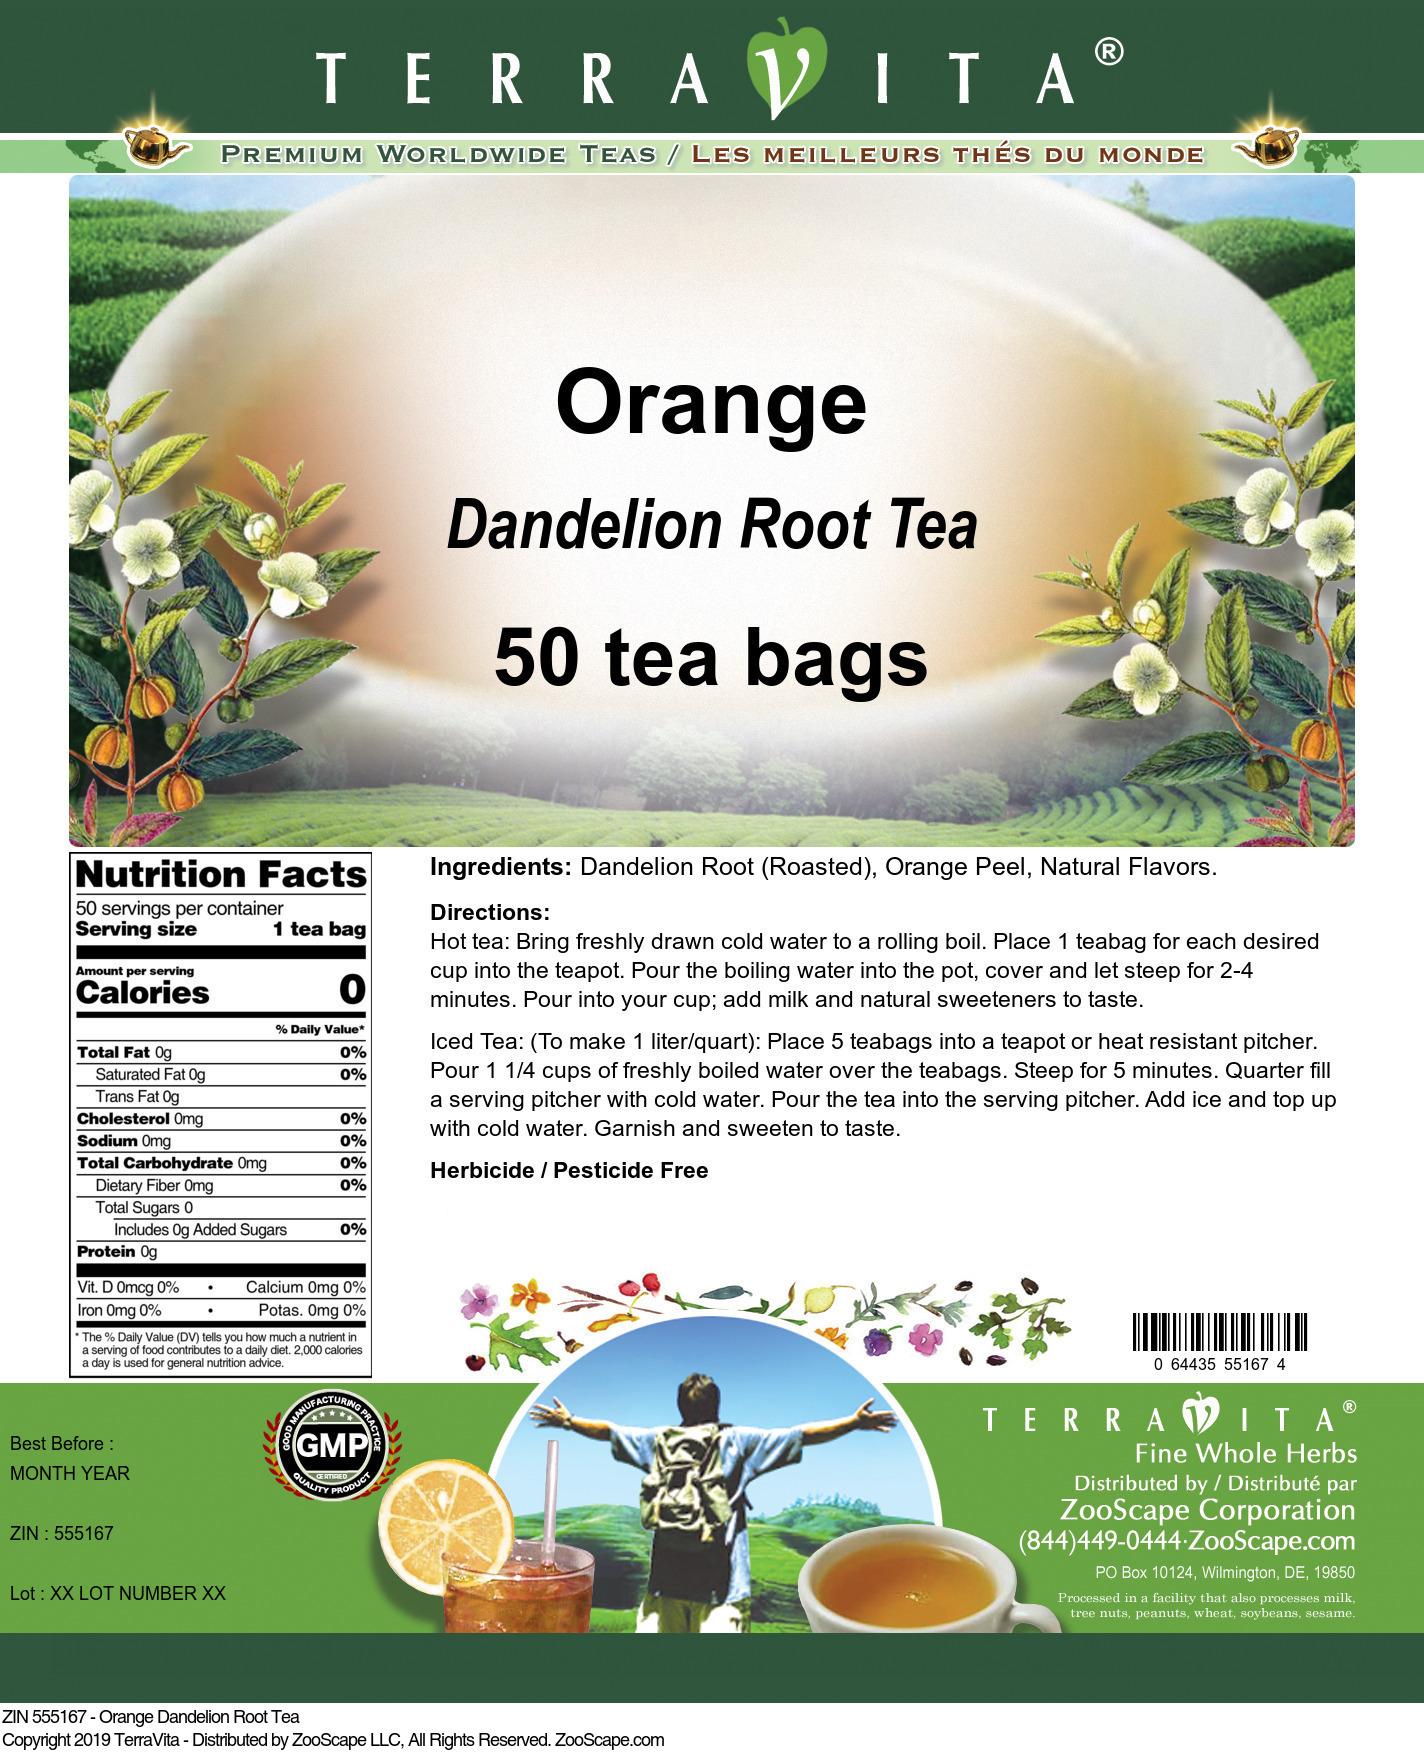 Orange Dandelion Root Tea